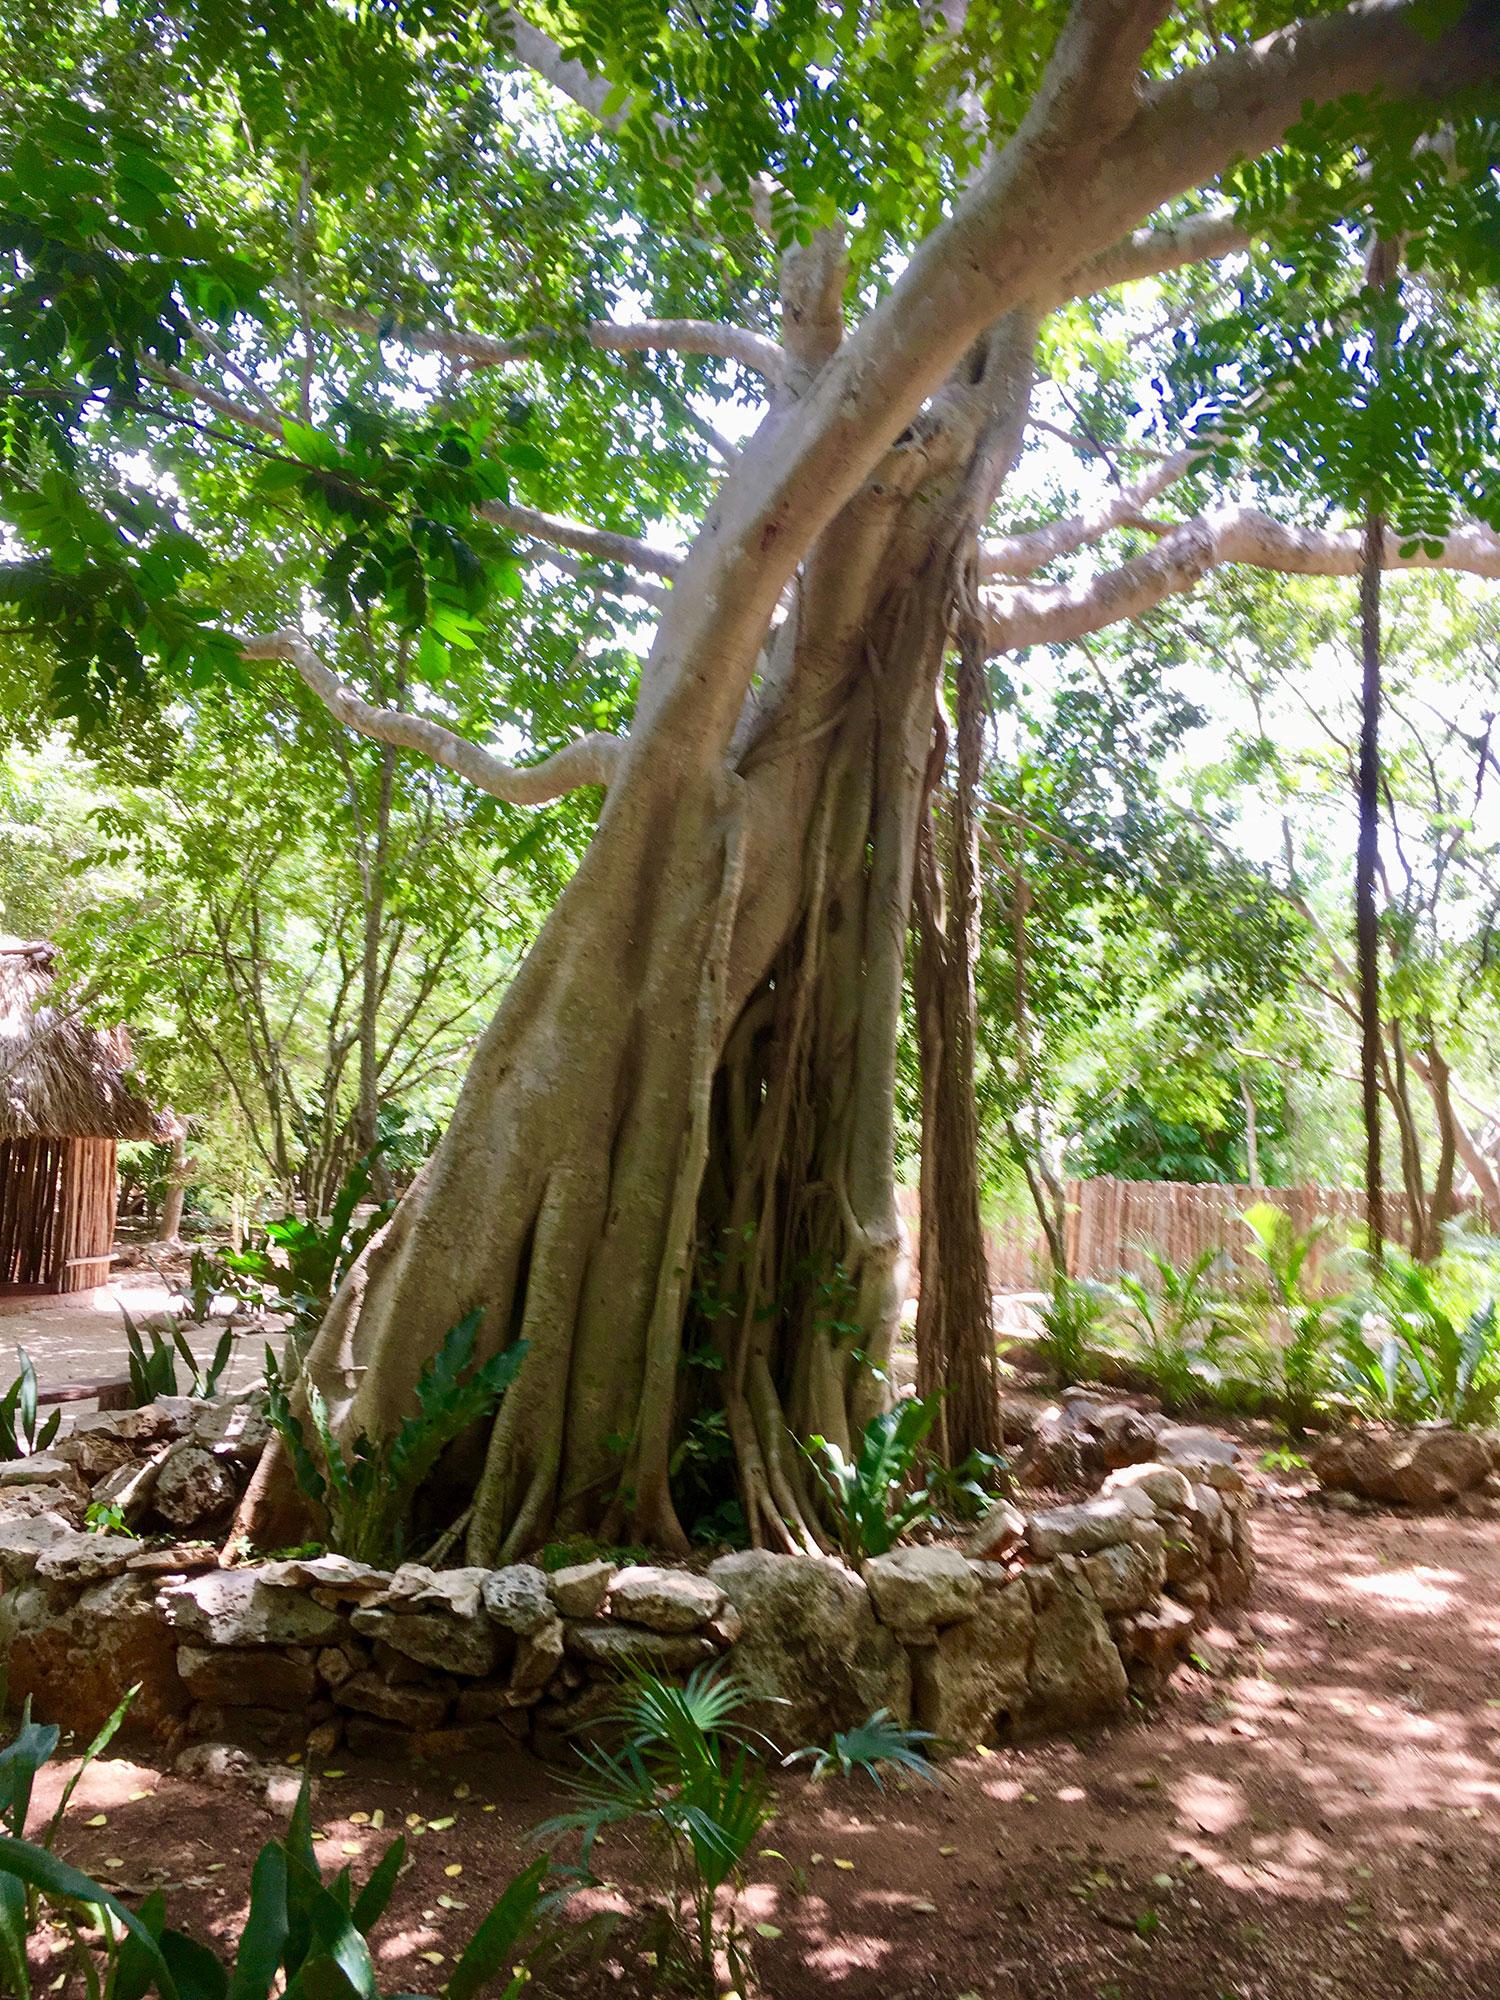 Alamo tree (cottonwood).